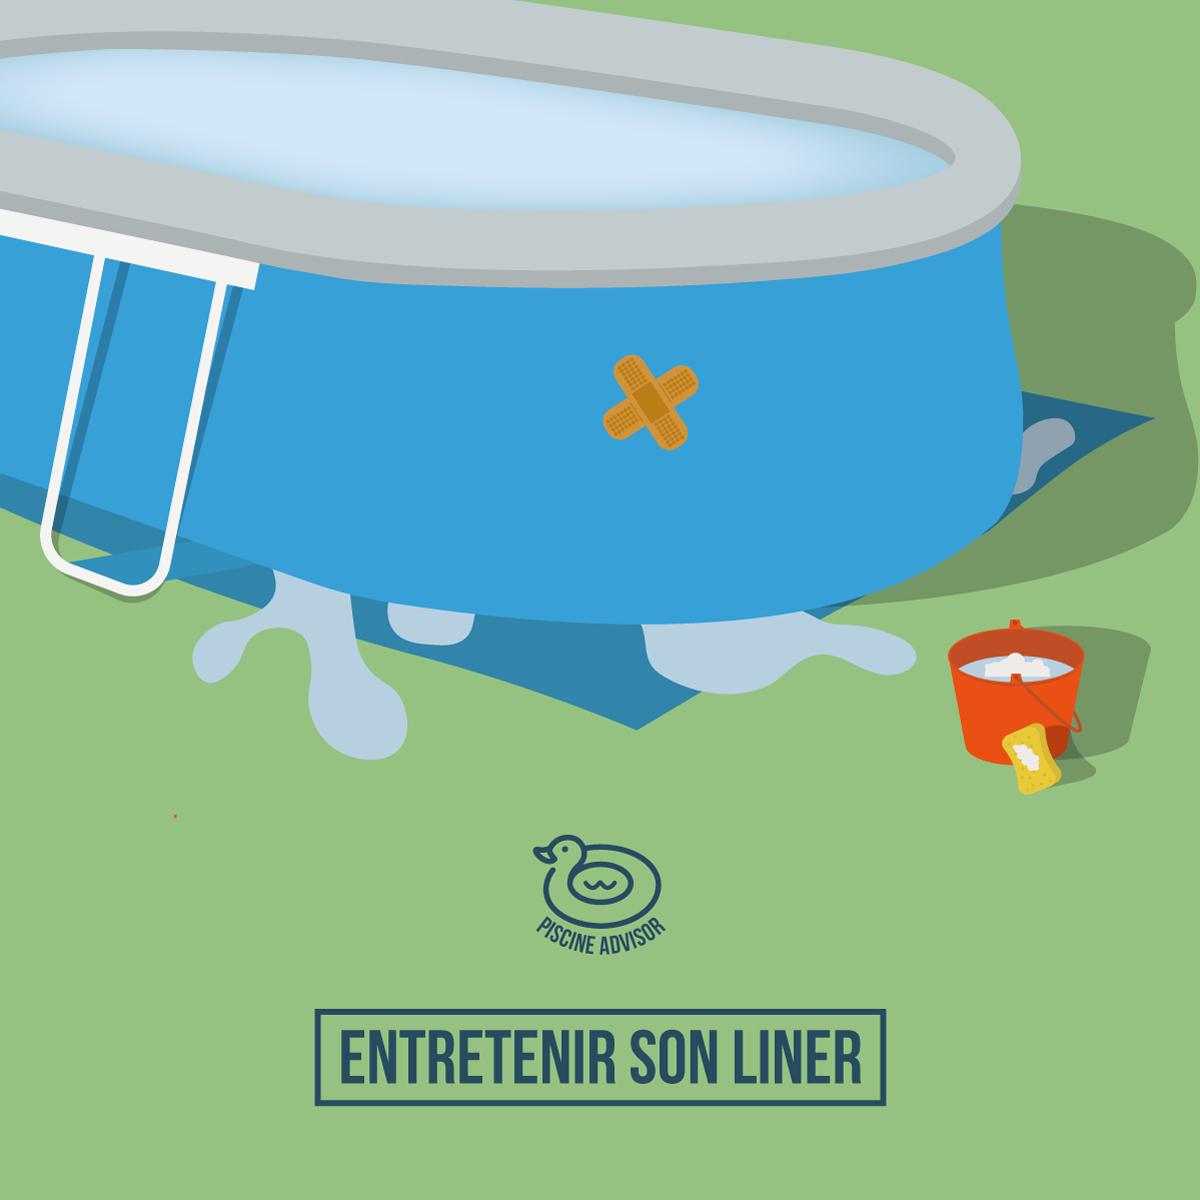 Liner Piscine Hors Sol: Entretien Et Prévention Des Fuites ... concernant Reparation Liner Piscine Hors Sol